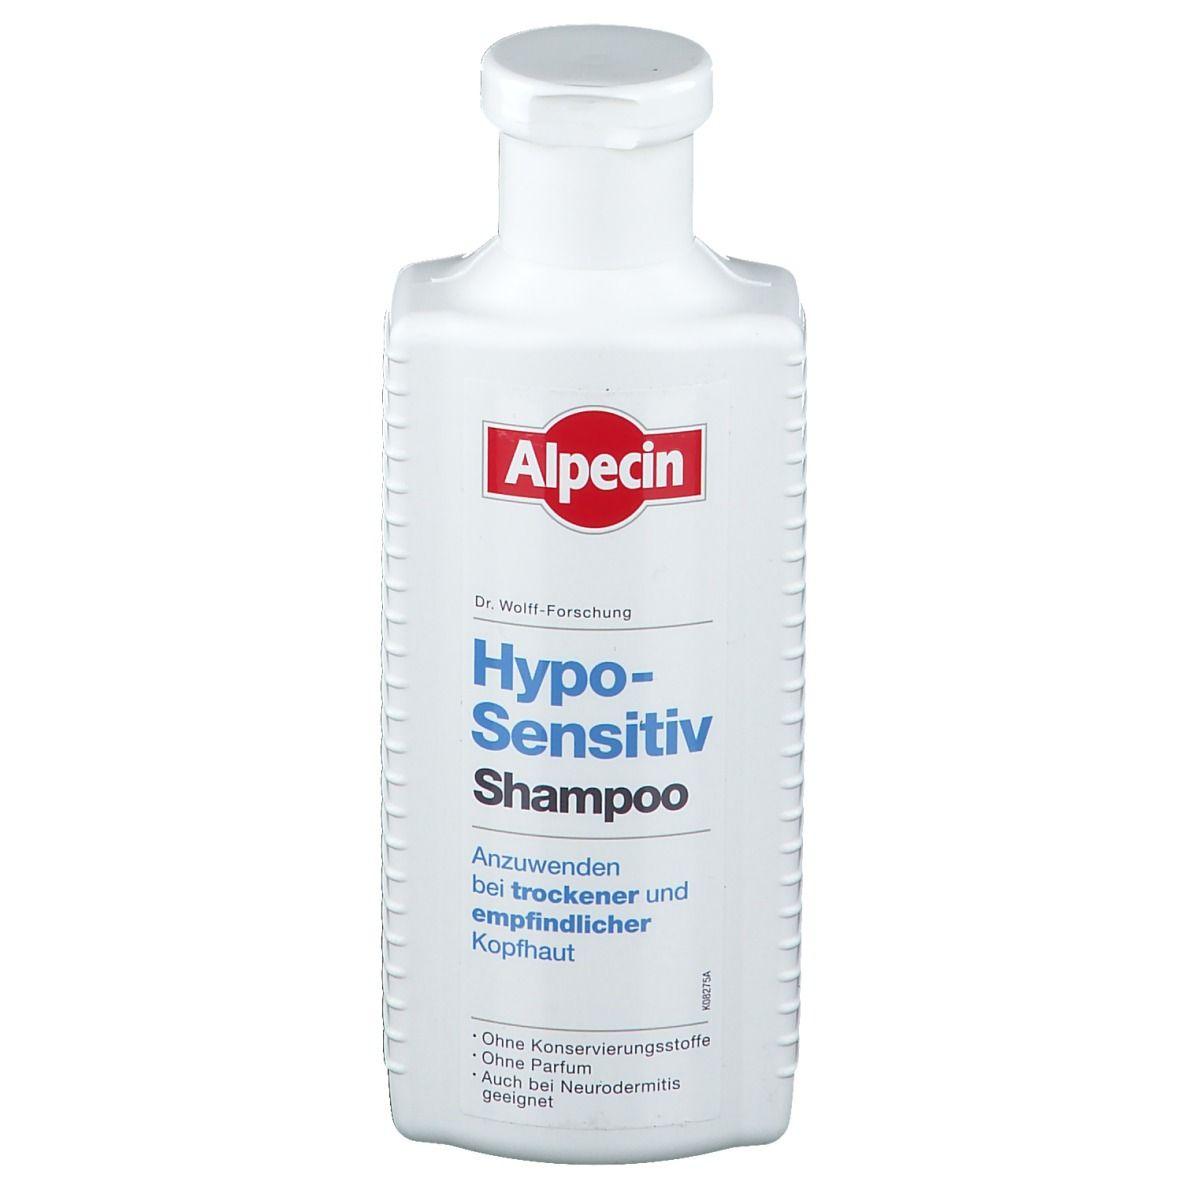 Image of Alepcin Shampooing Hypo-Sensitivität